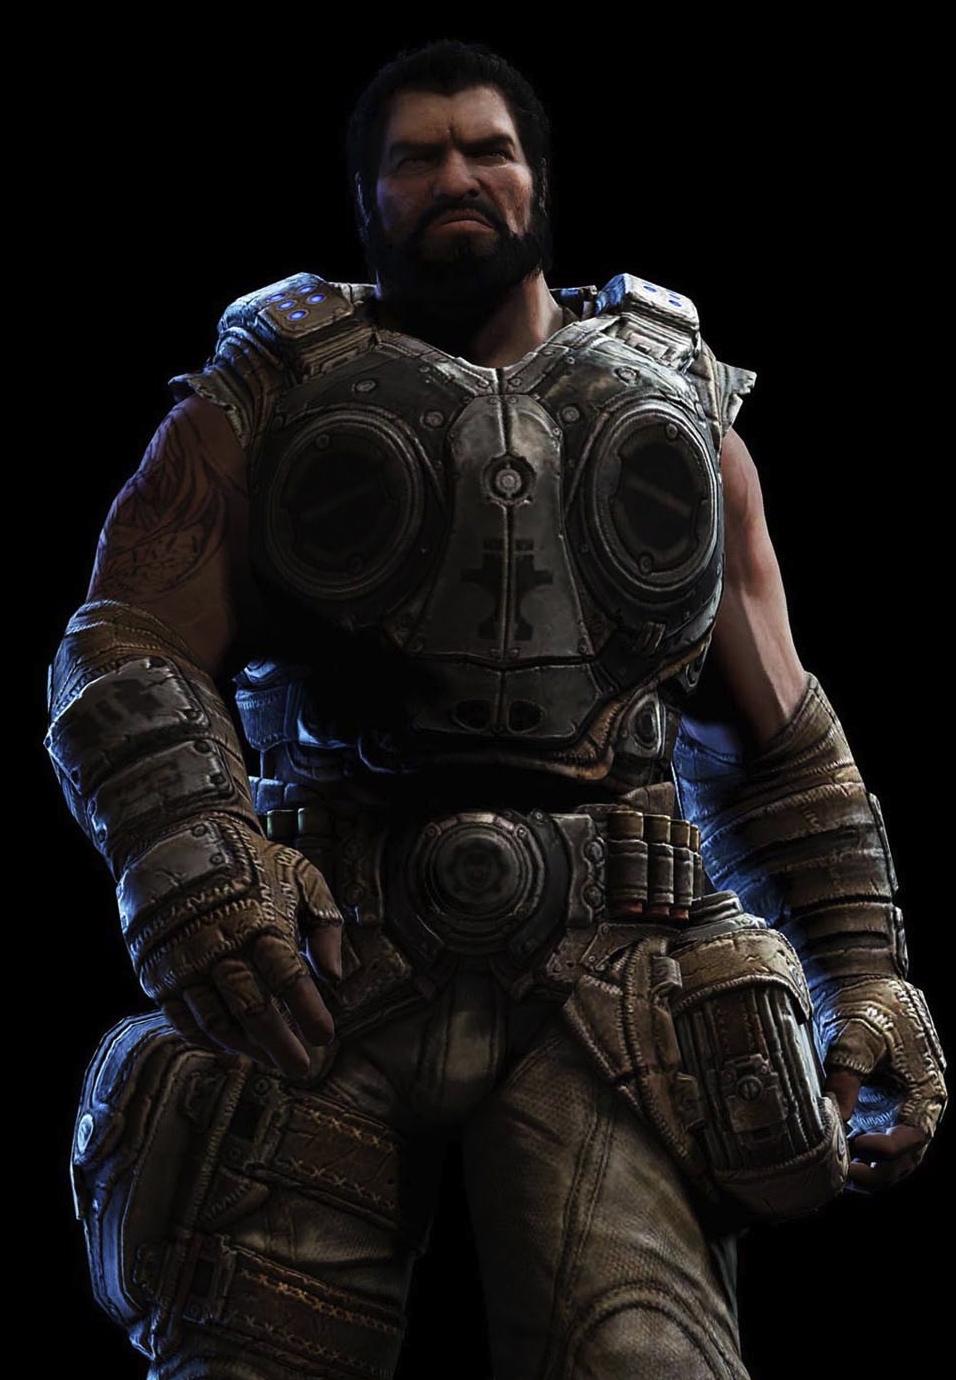 Gears of war 3 trailer latino dating